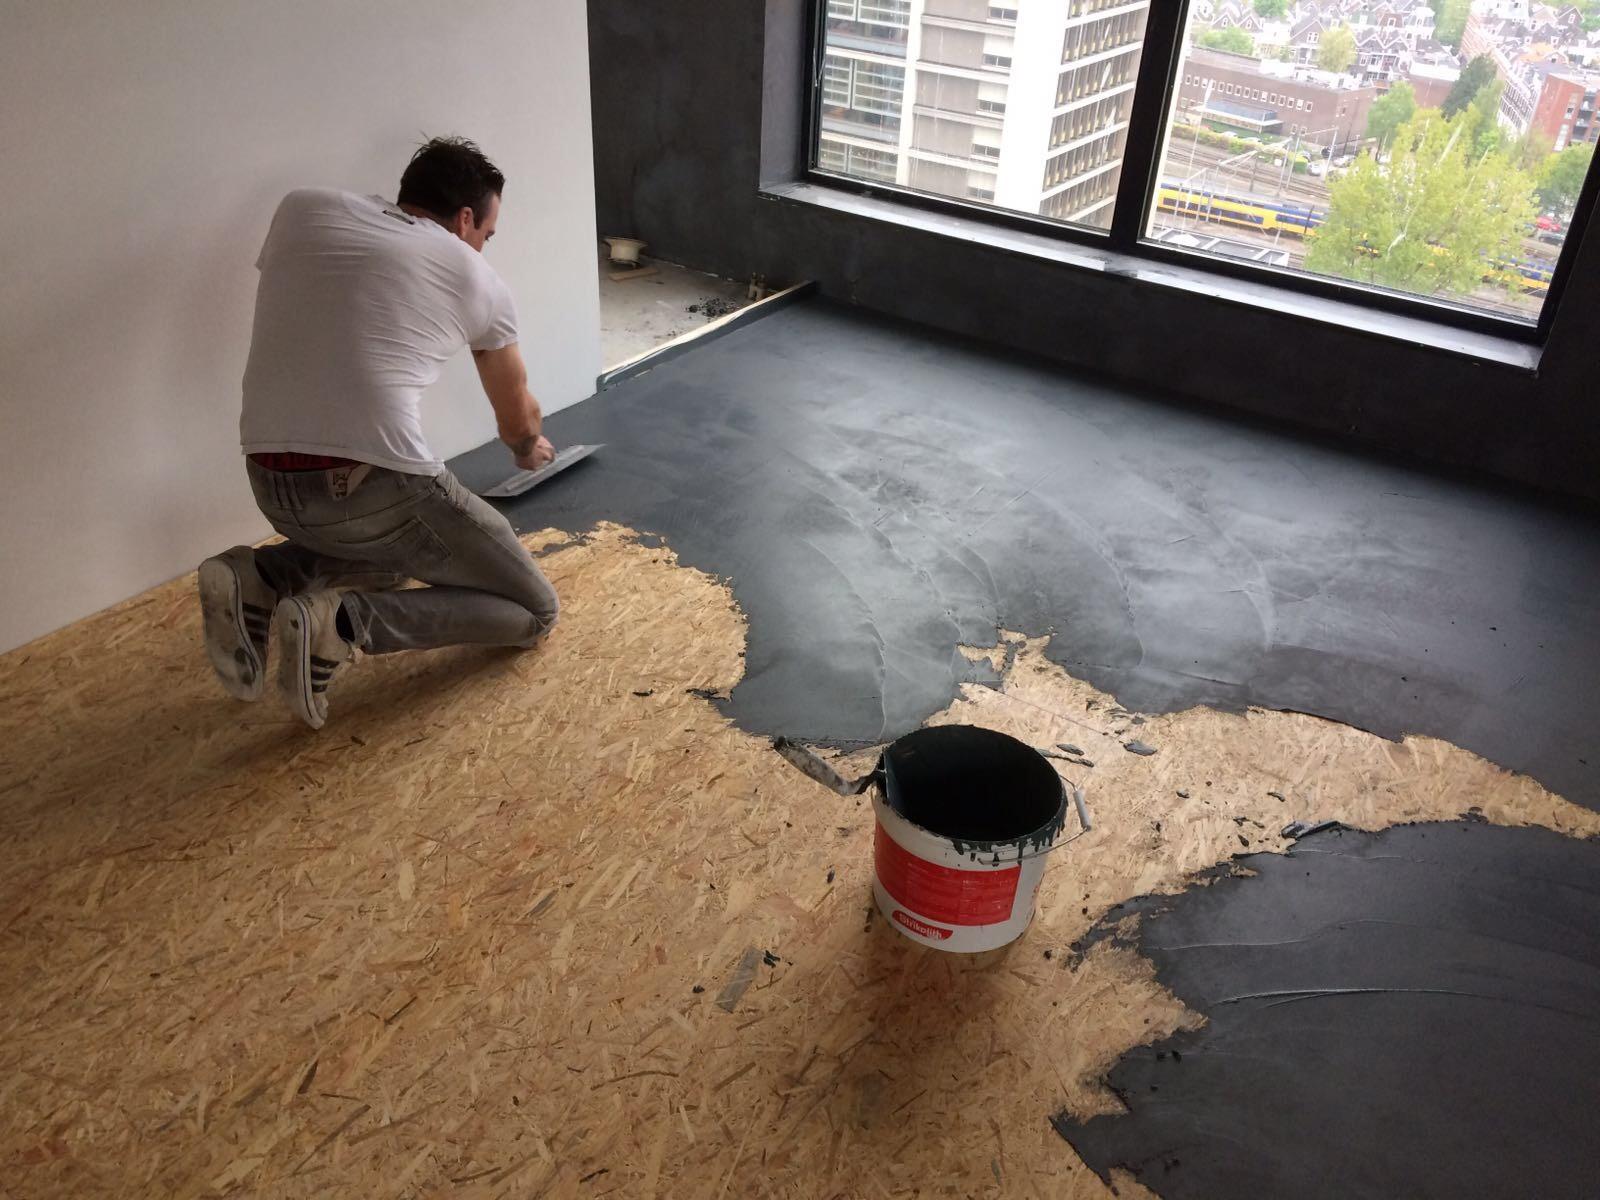 leef beton rotterdam betonlook wanden en vloer in penthouse. Black Bedroom Furniture Sets. Home Design Ideas